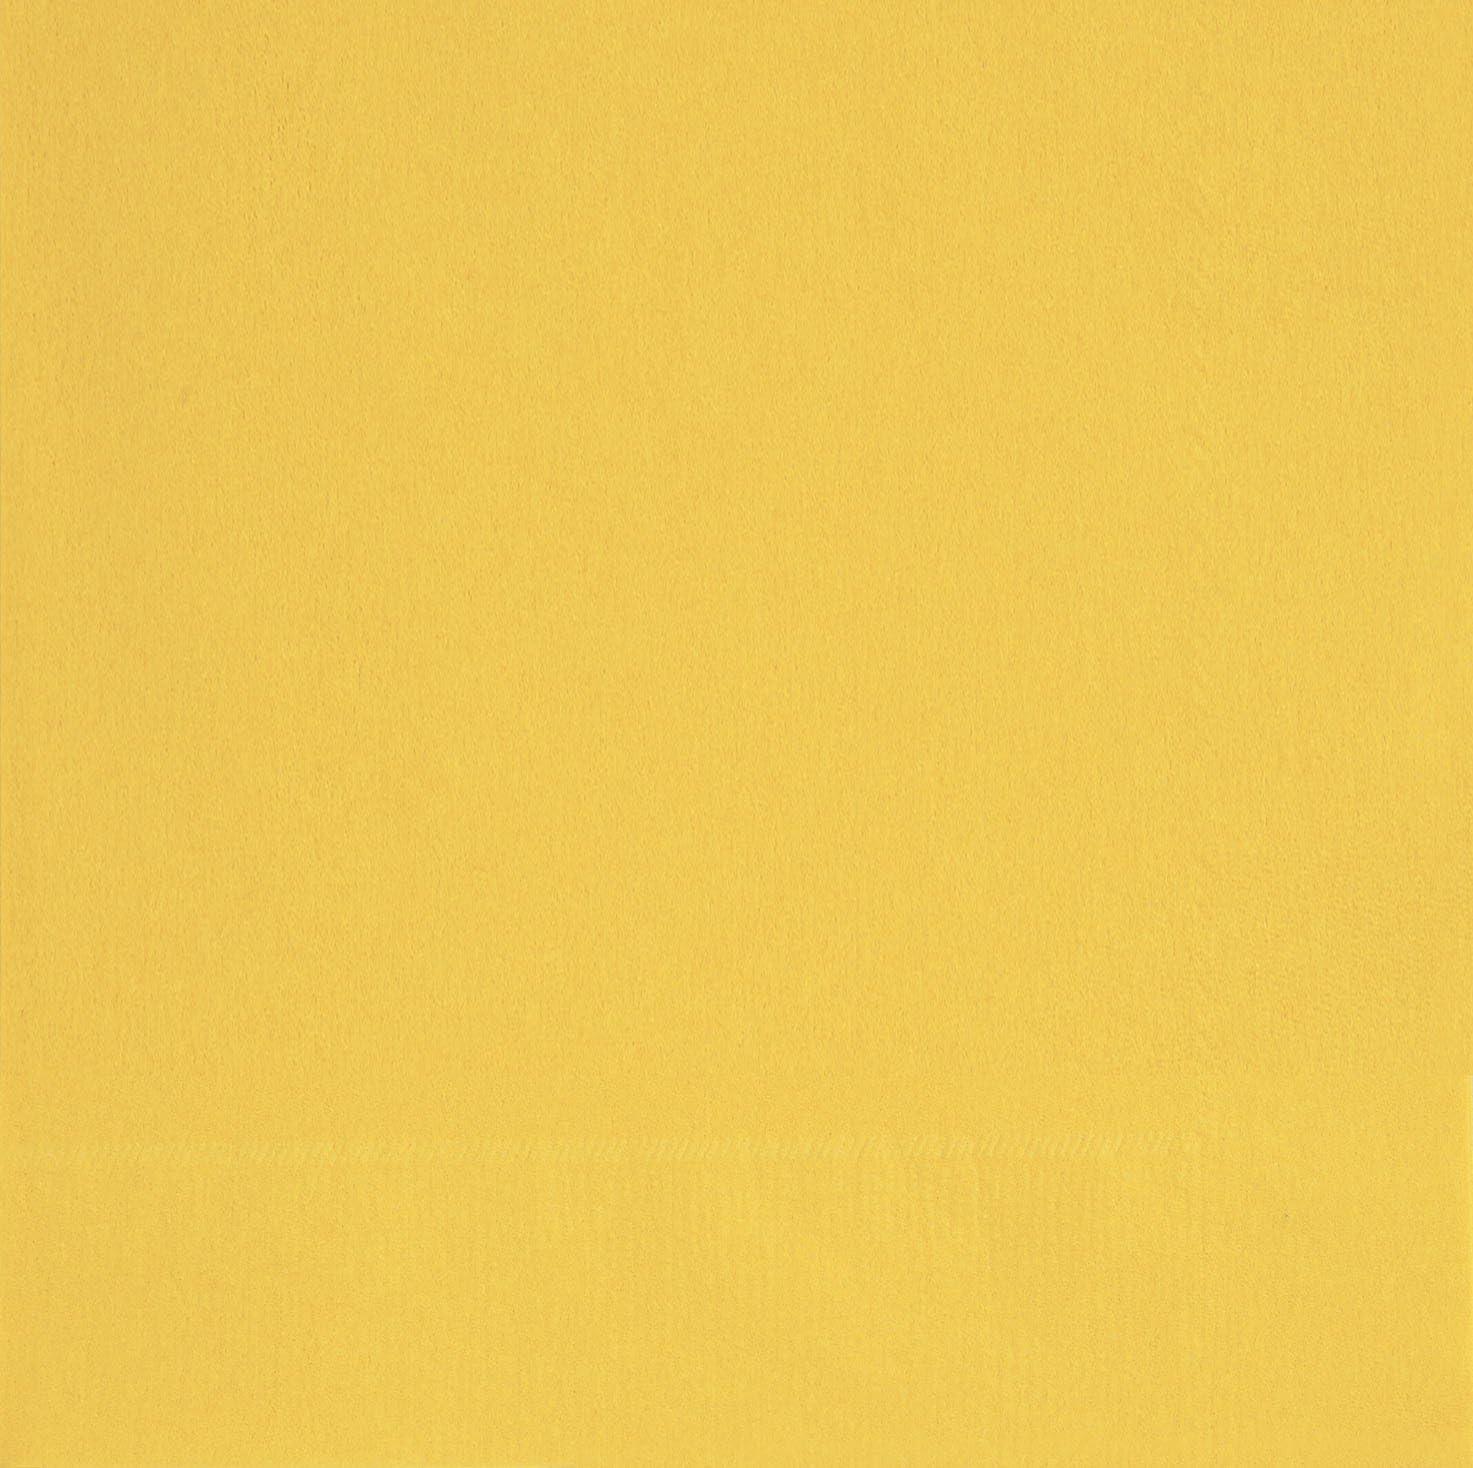 Unique Sunflower Yellow Beverage Napkins, 20ct